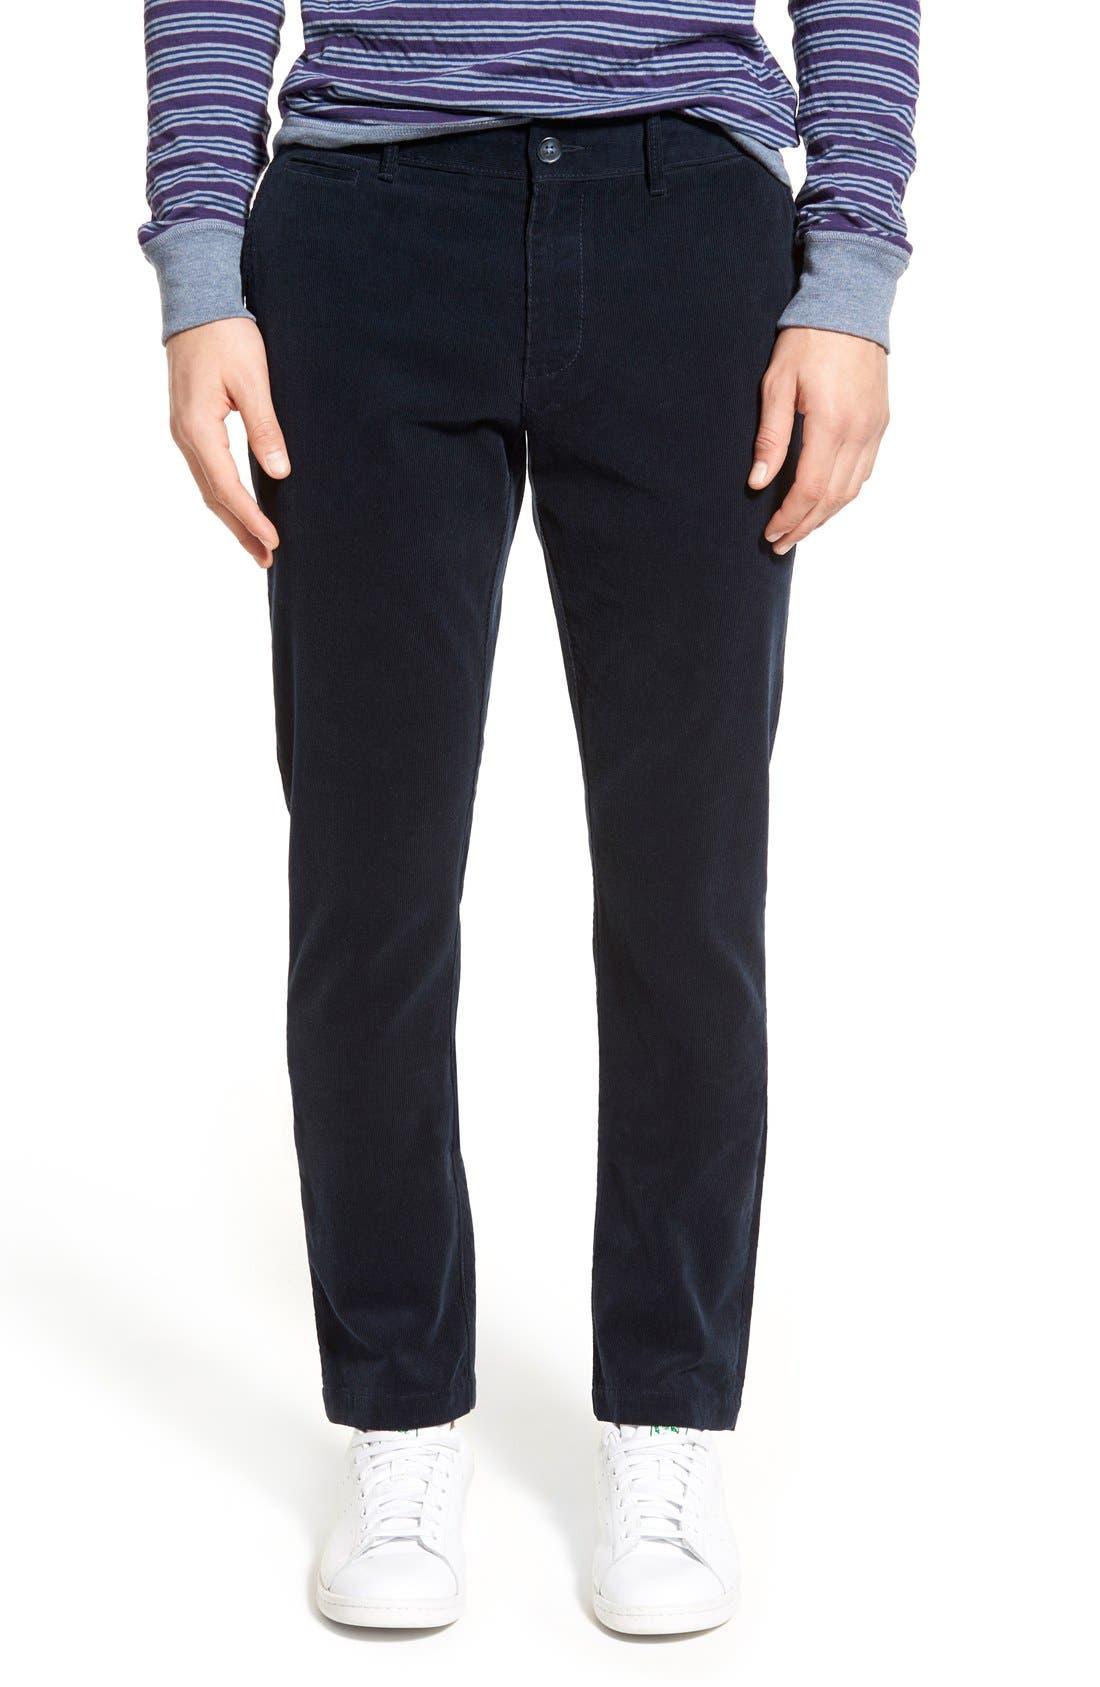 Original Penguin Mens P55 Slim Corduroy 5 Pocket Pant